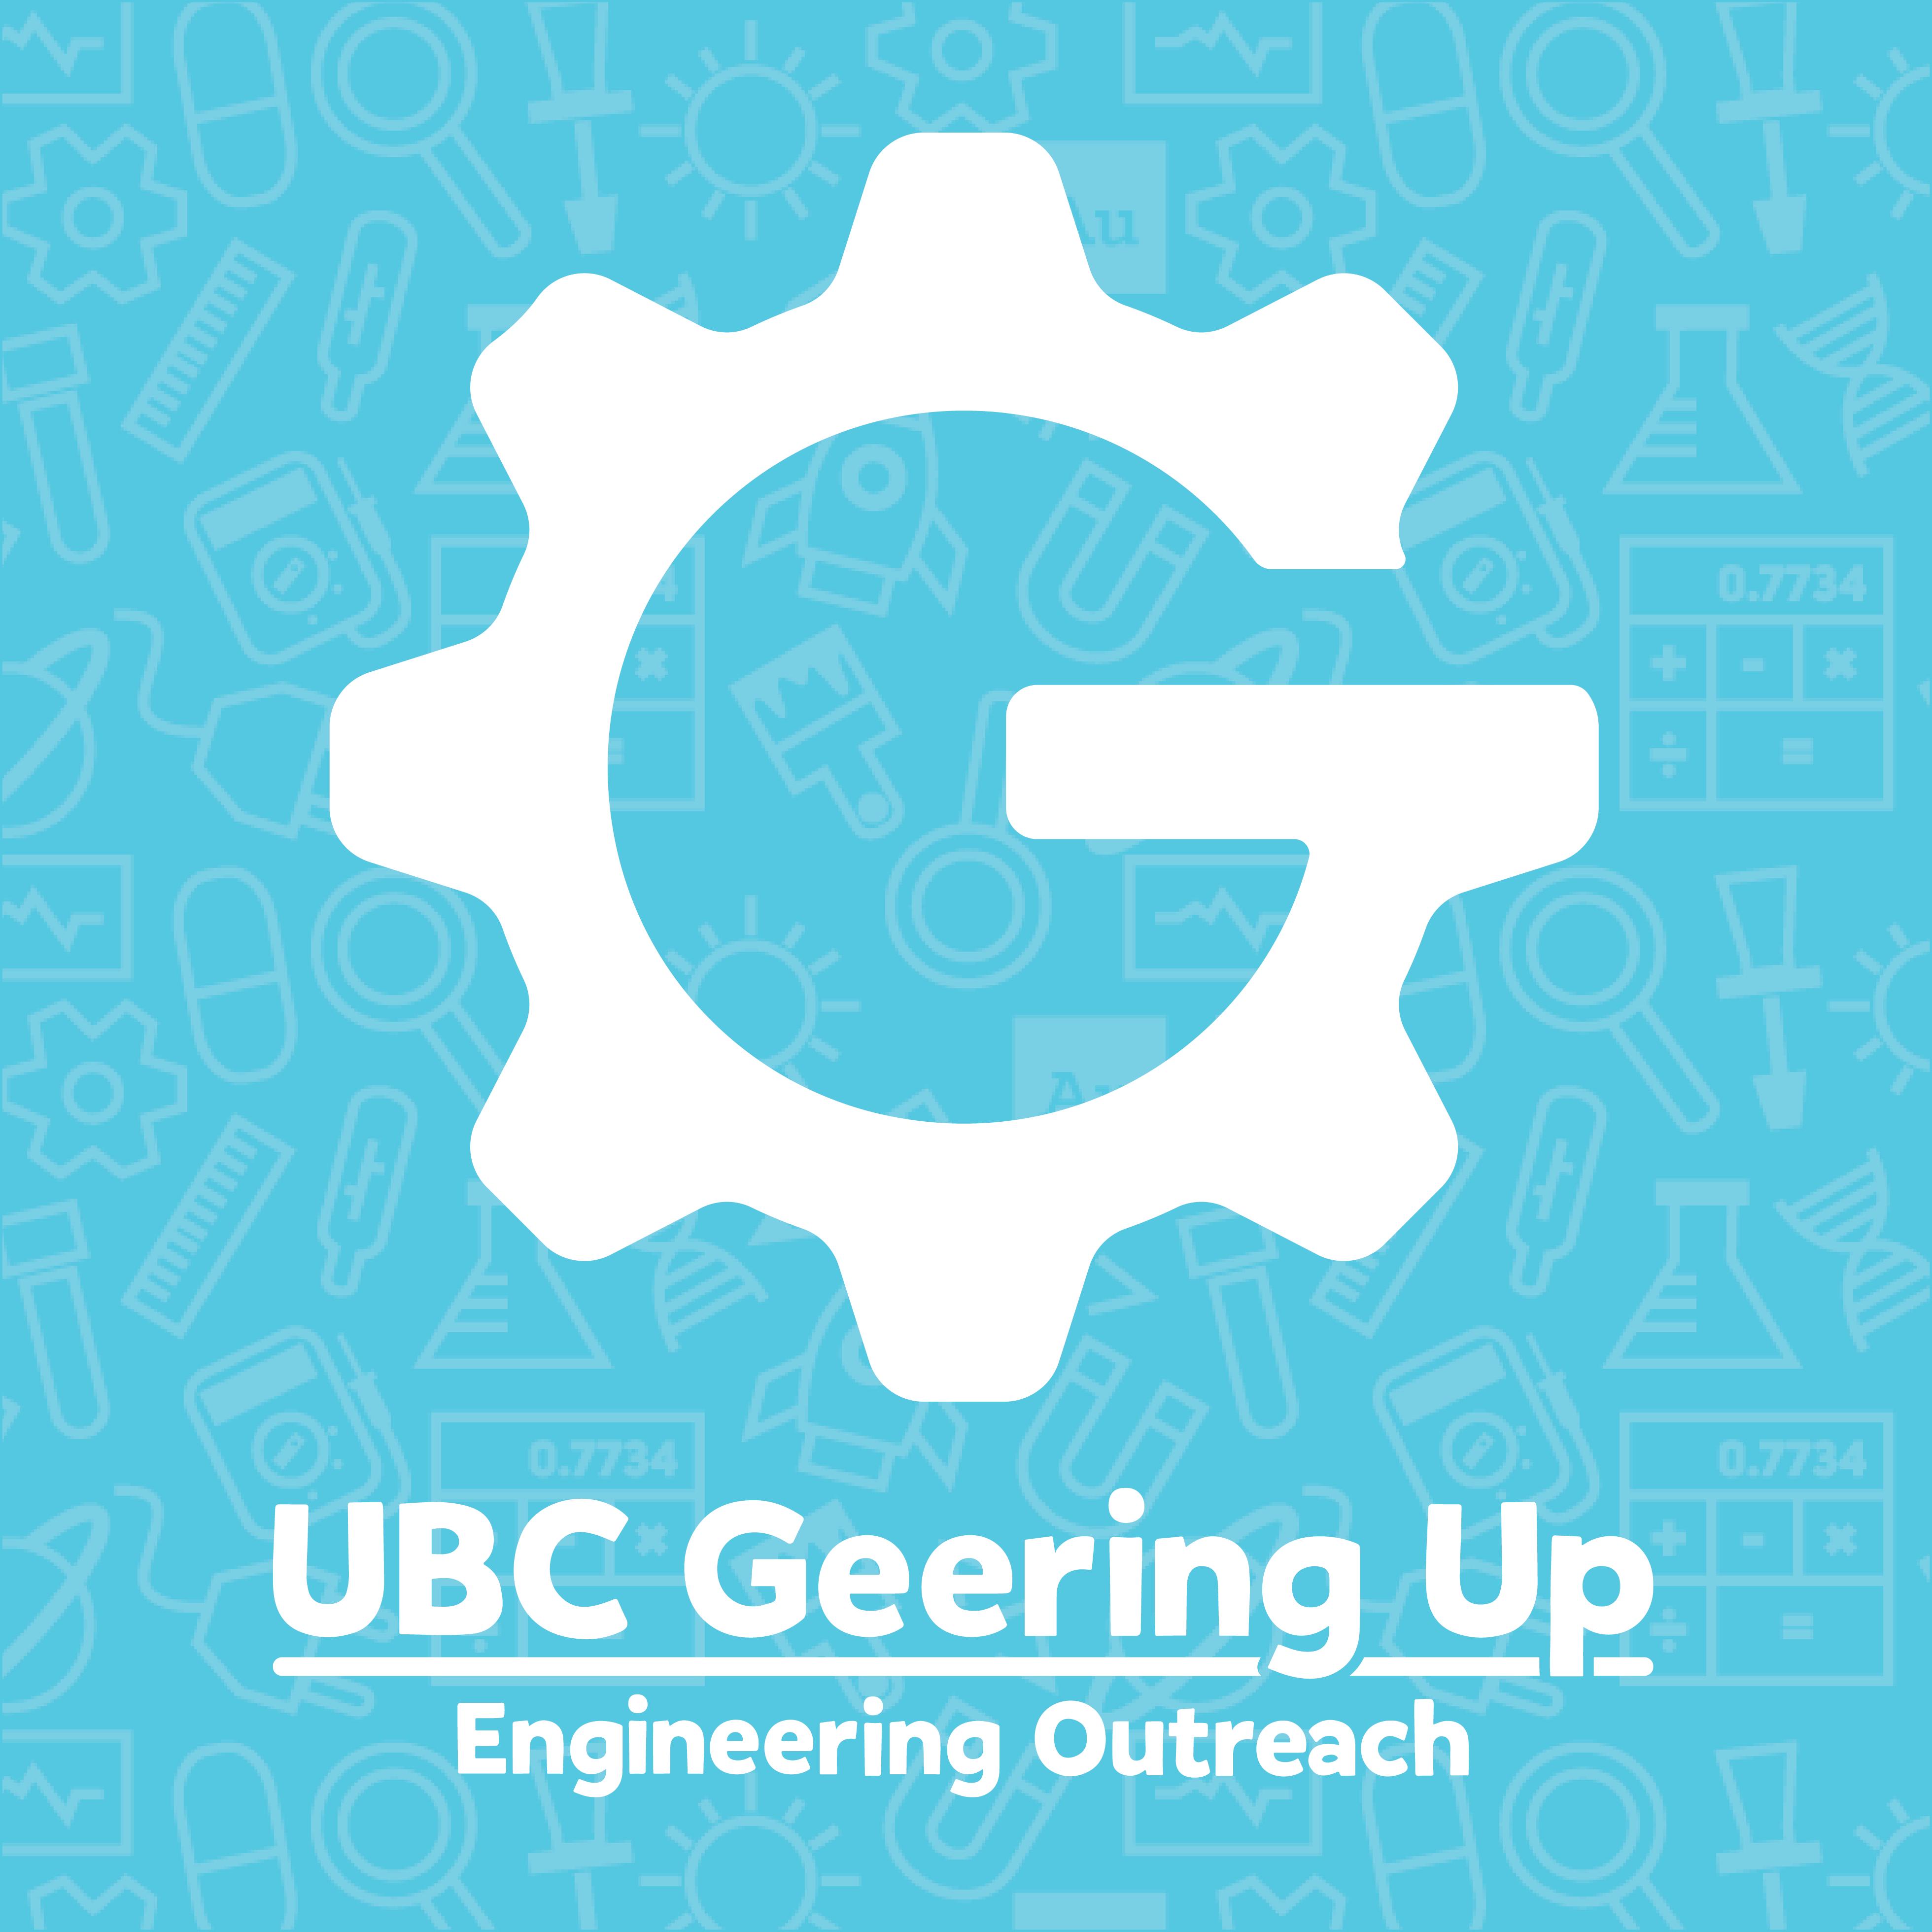 Let's Talk Tech! - Morning, Grades 4-5 - Vancouver, BC 2020